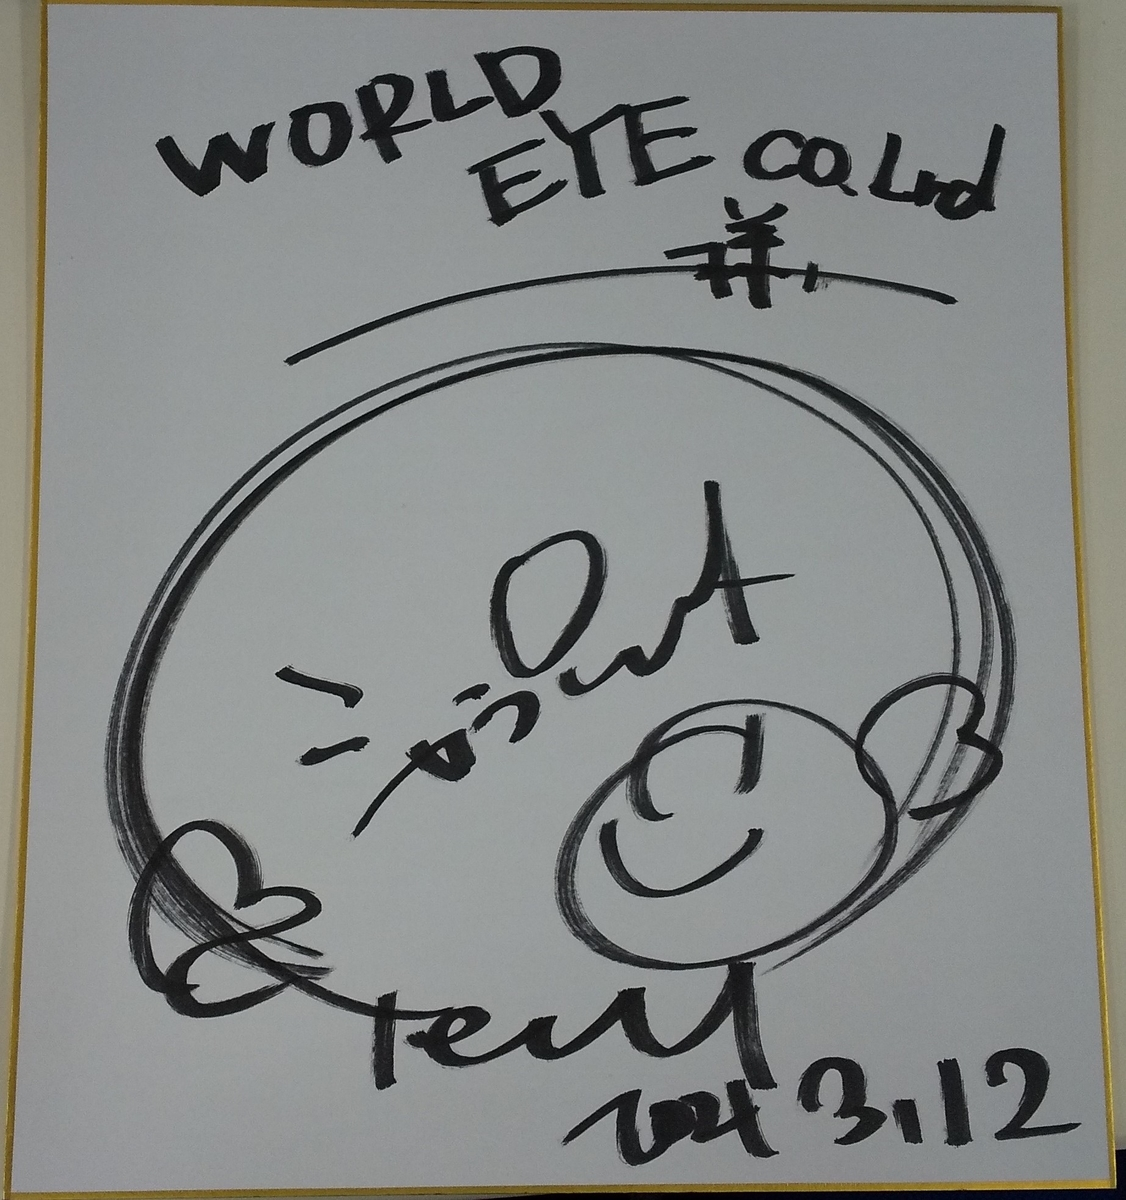 f:id:worldeyecorp:20210407111235j:plain